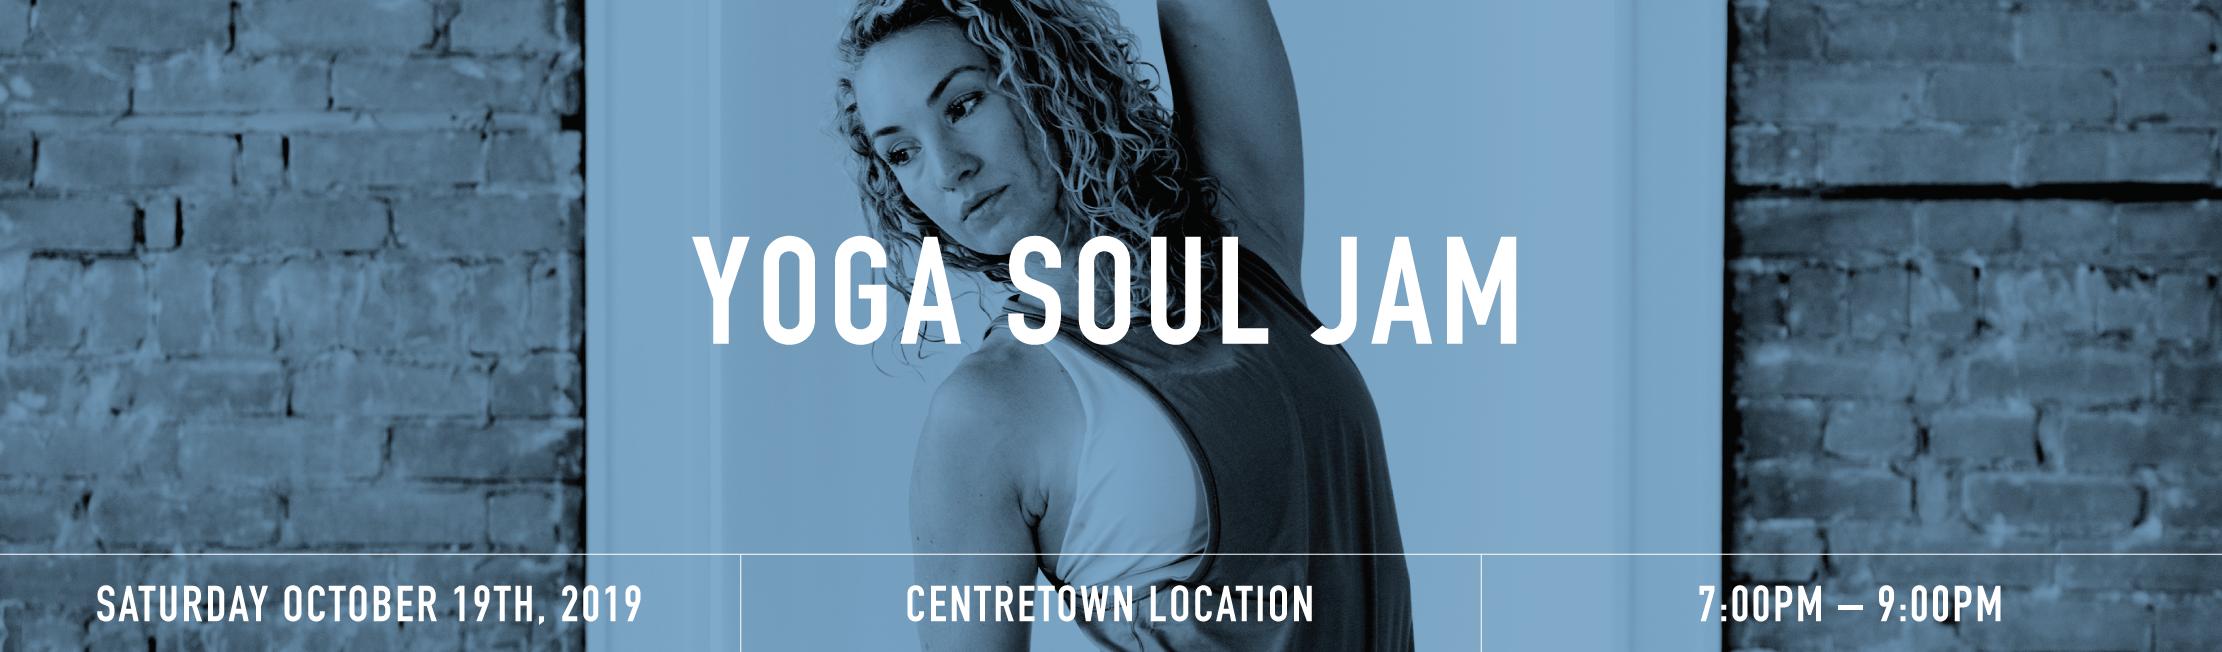 Yoga jam banner